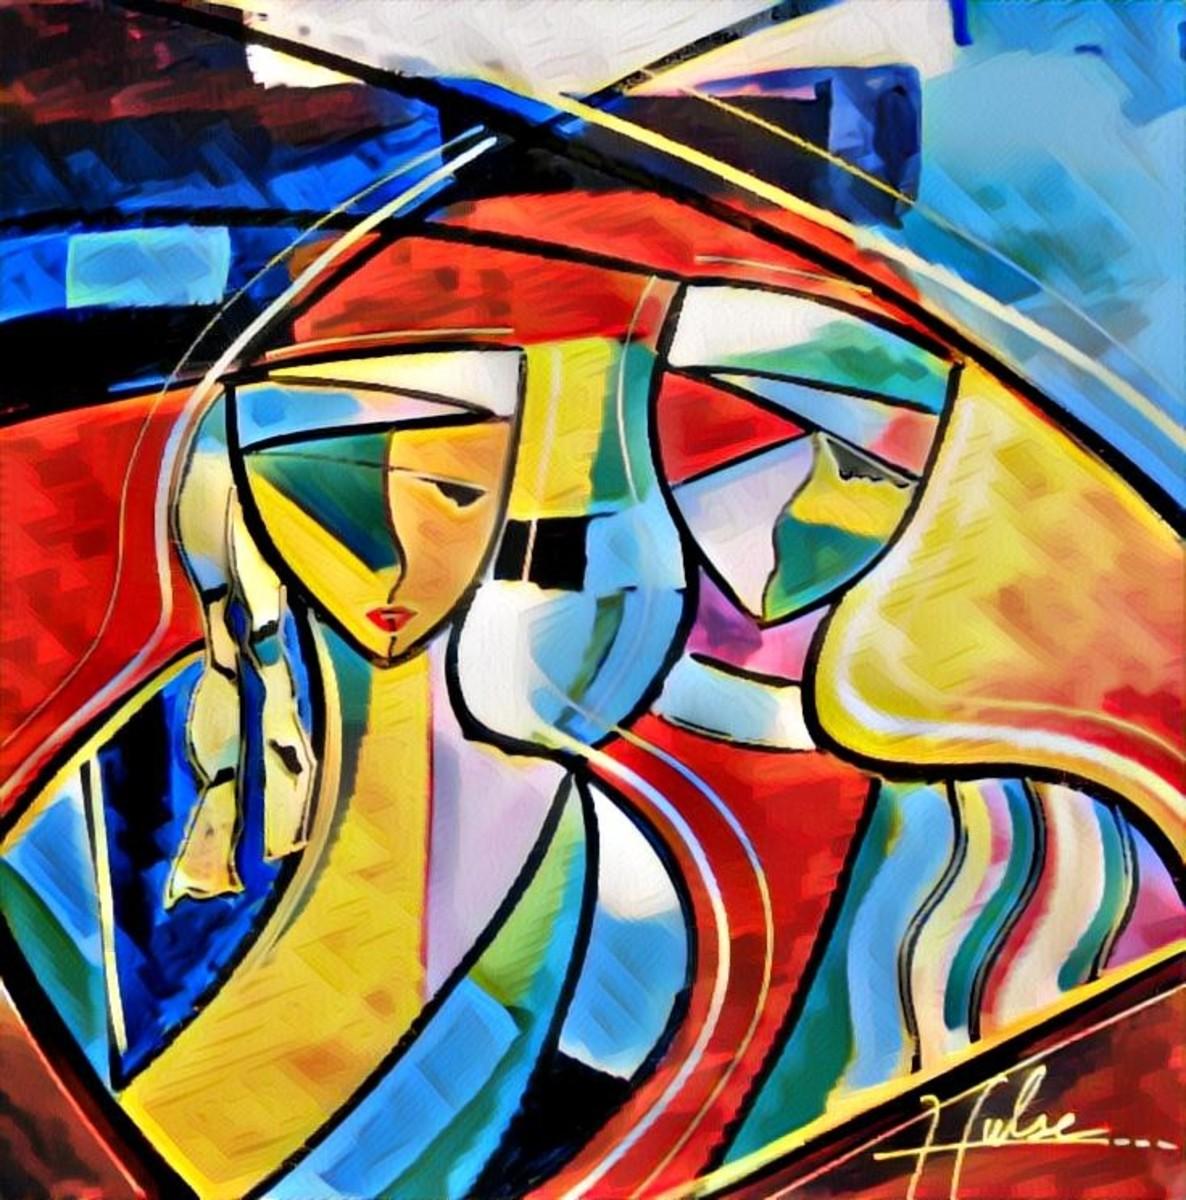 Original art by Gina Welds Hulse